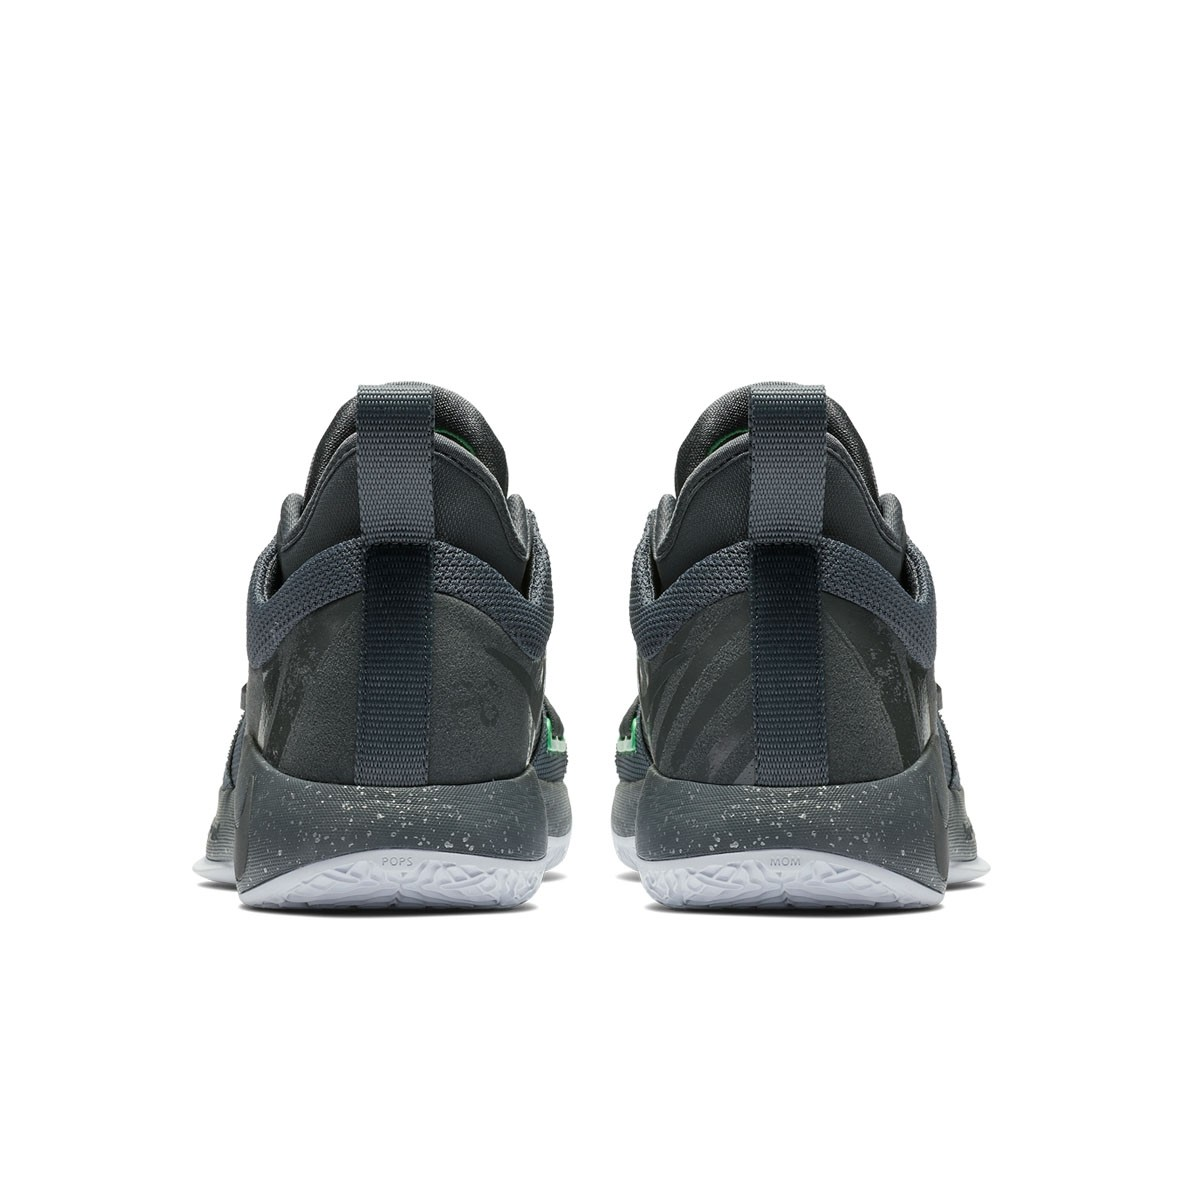 Nike PG 2.5 'Fighter Jet' BQ8452-007